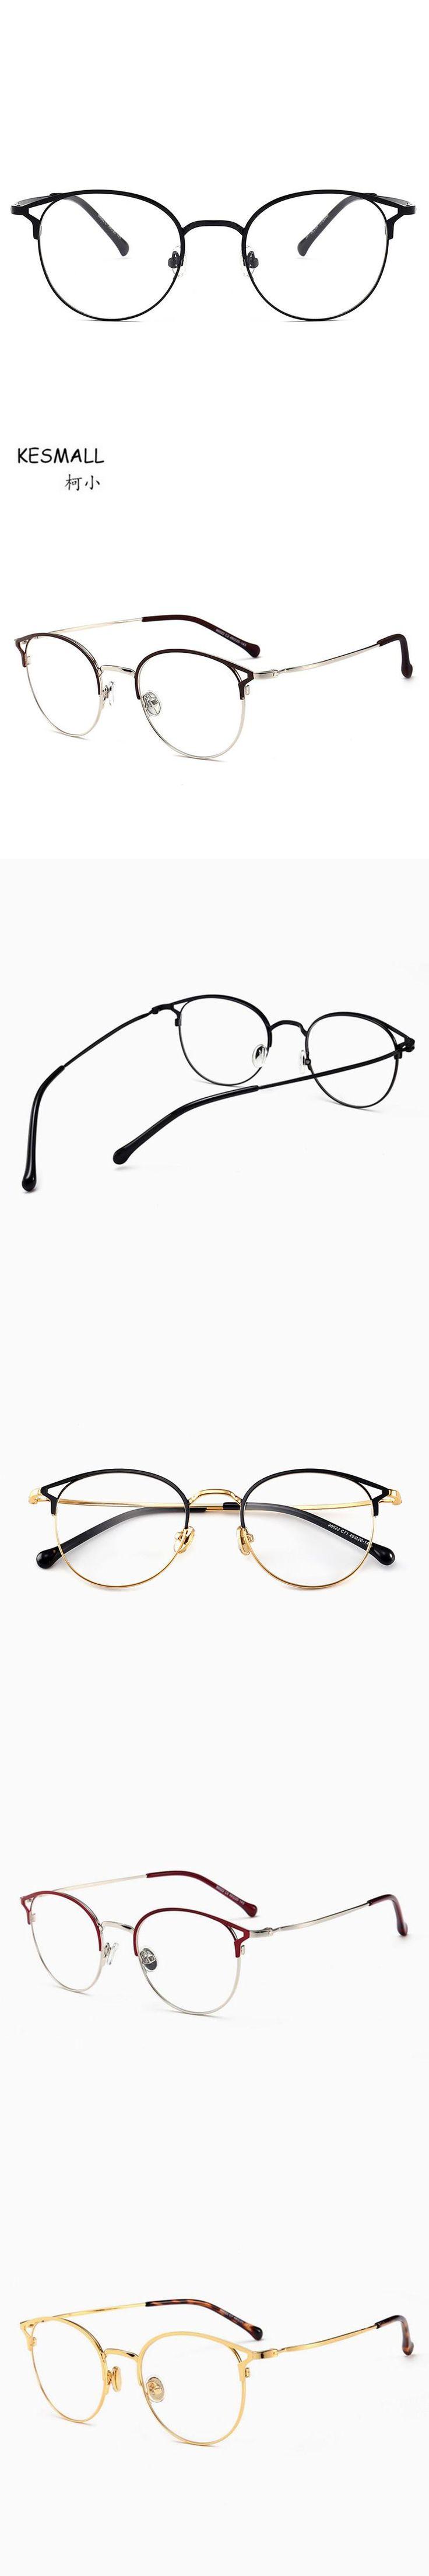 KESMALL Newest Alloy Glasses Frame High Quality Clear Lens Eyewear Men Women Gold Color Eyeglasses Frames Marco De Lentes XN561